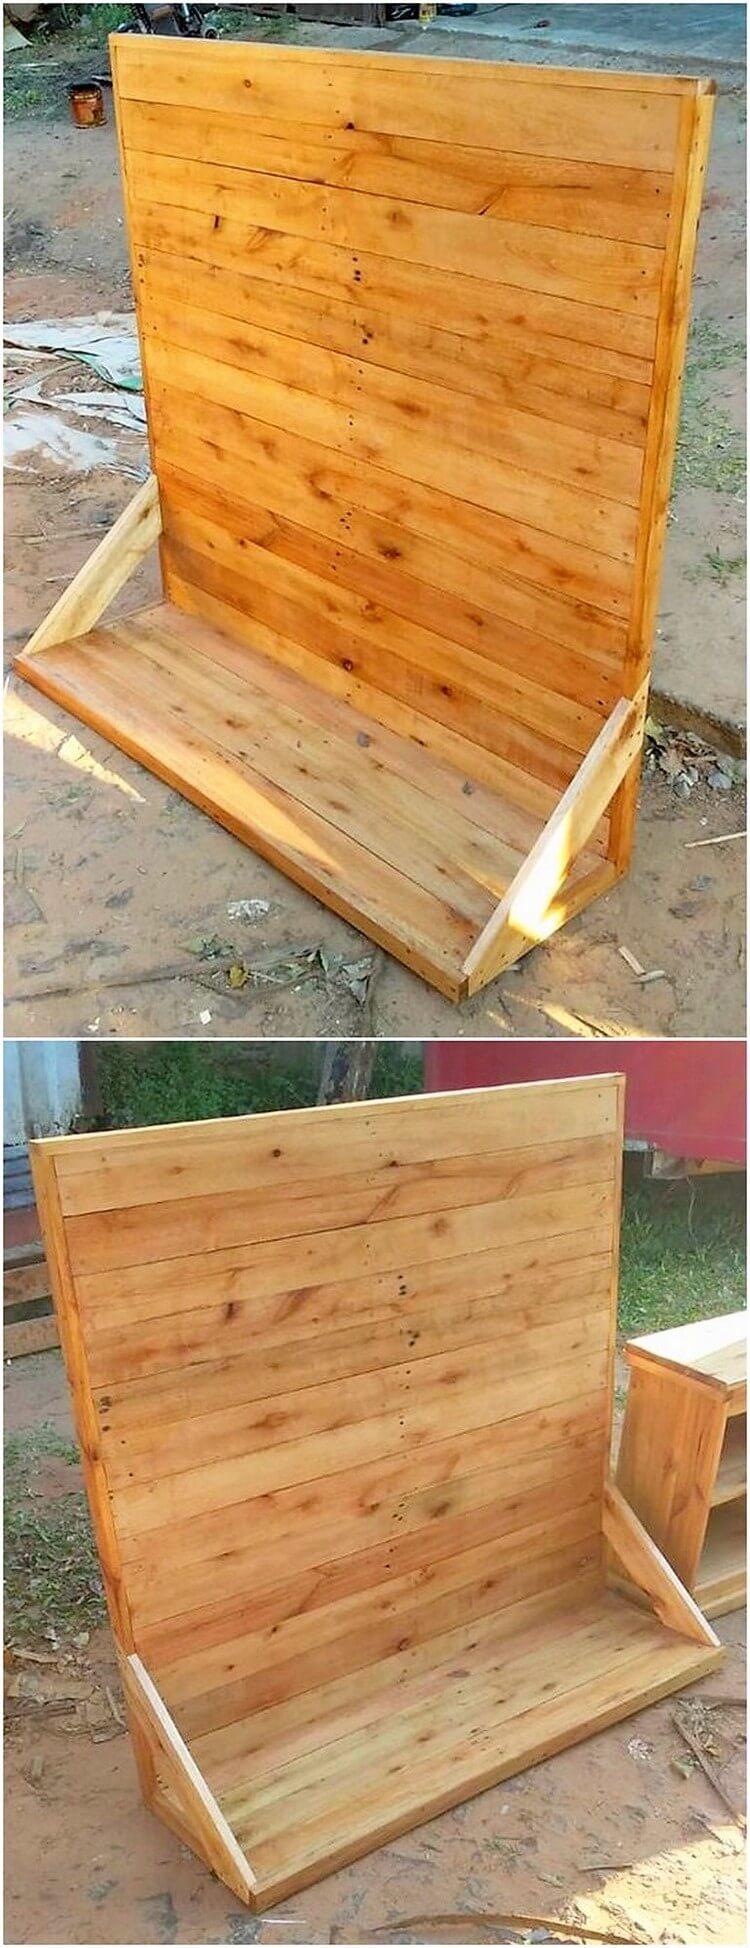 Wood Pallet Creation